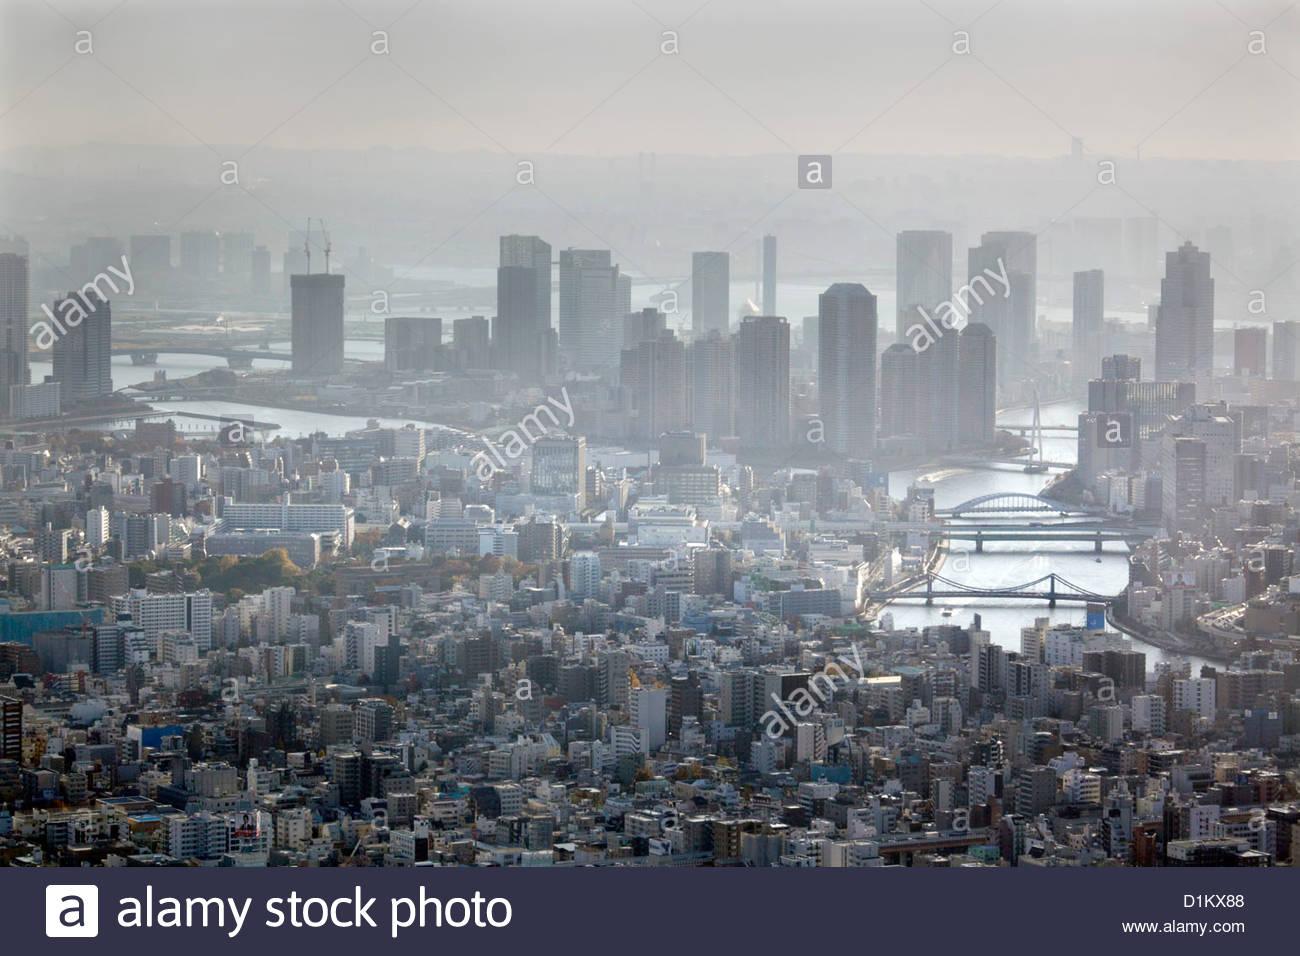 Luftbild Tokio am Flussufer Wohnhochhäusern und Sumida-Fluss Stockbild